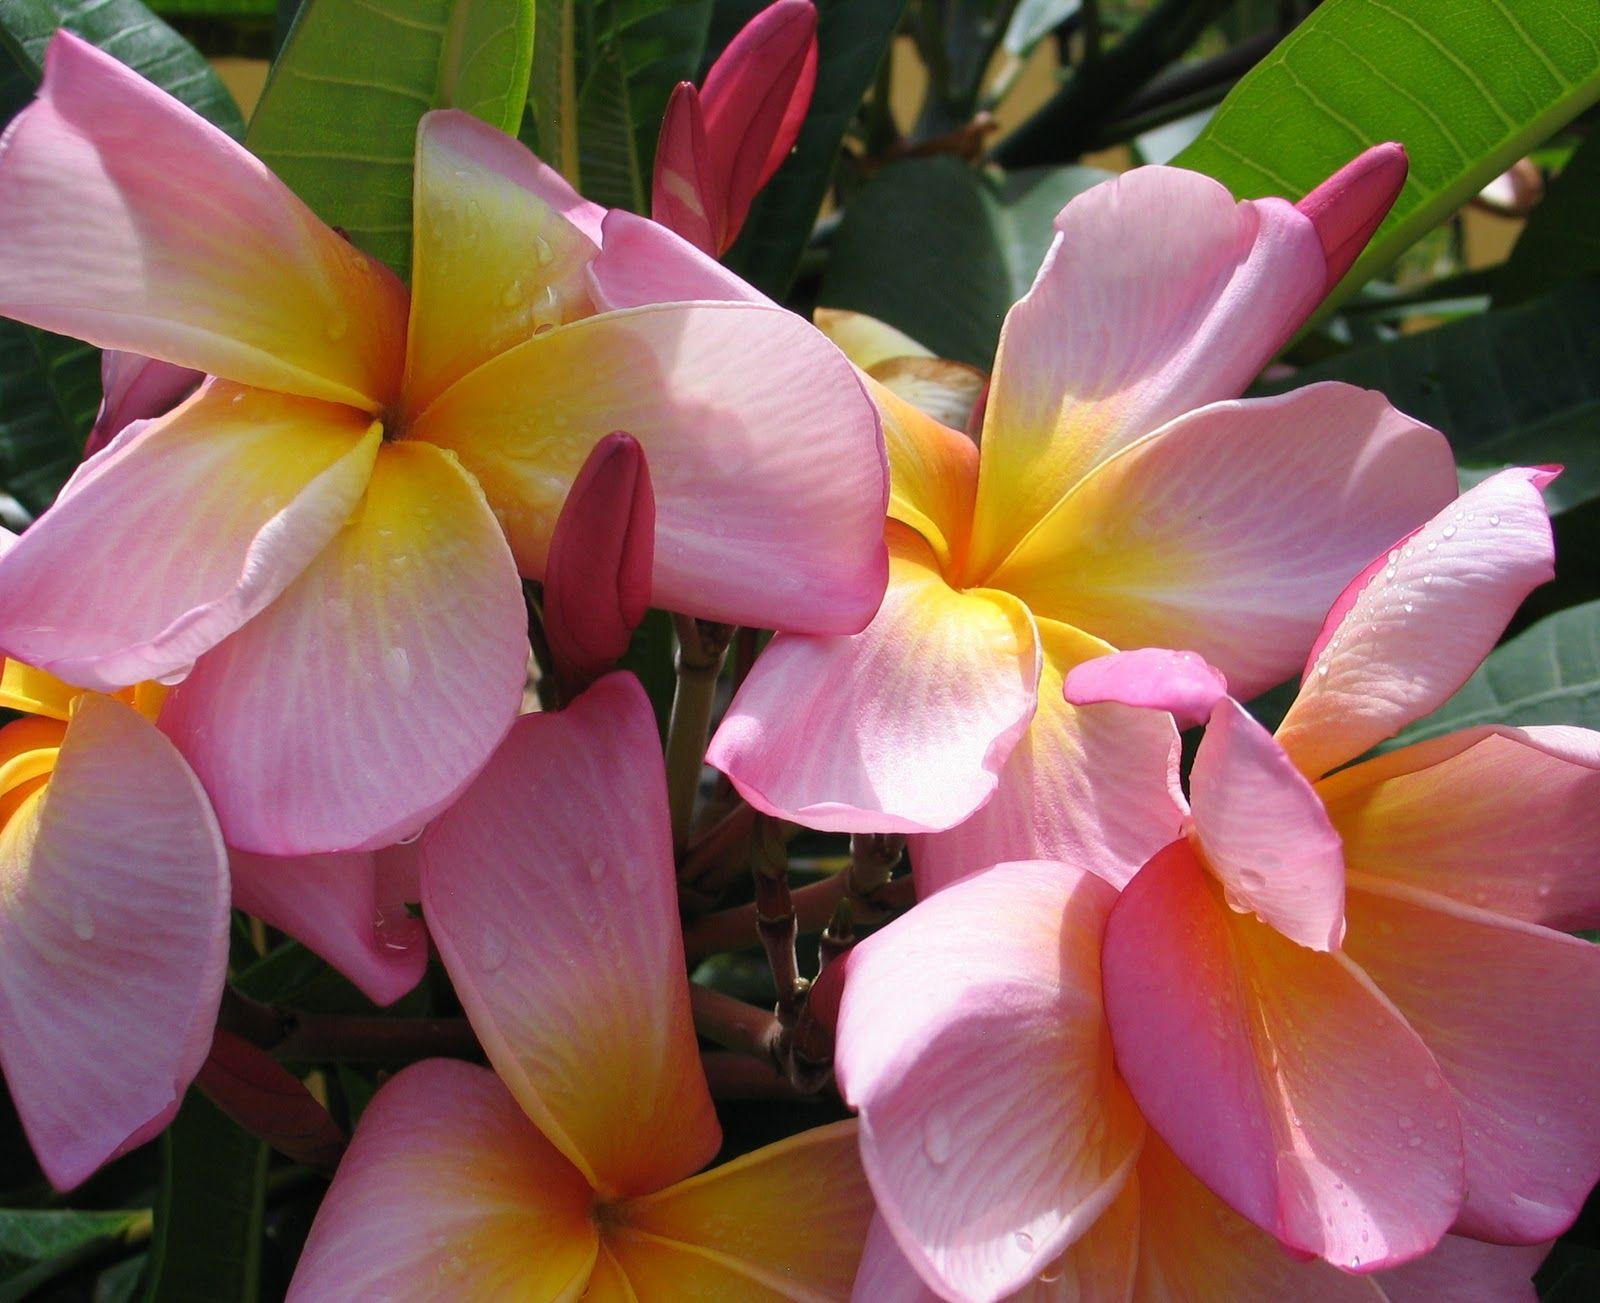 Types of hawaiian flowers tropical flowers plumeria pinterest types of hawaiian flowers tropical flowers izmirmasajfo